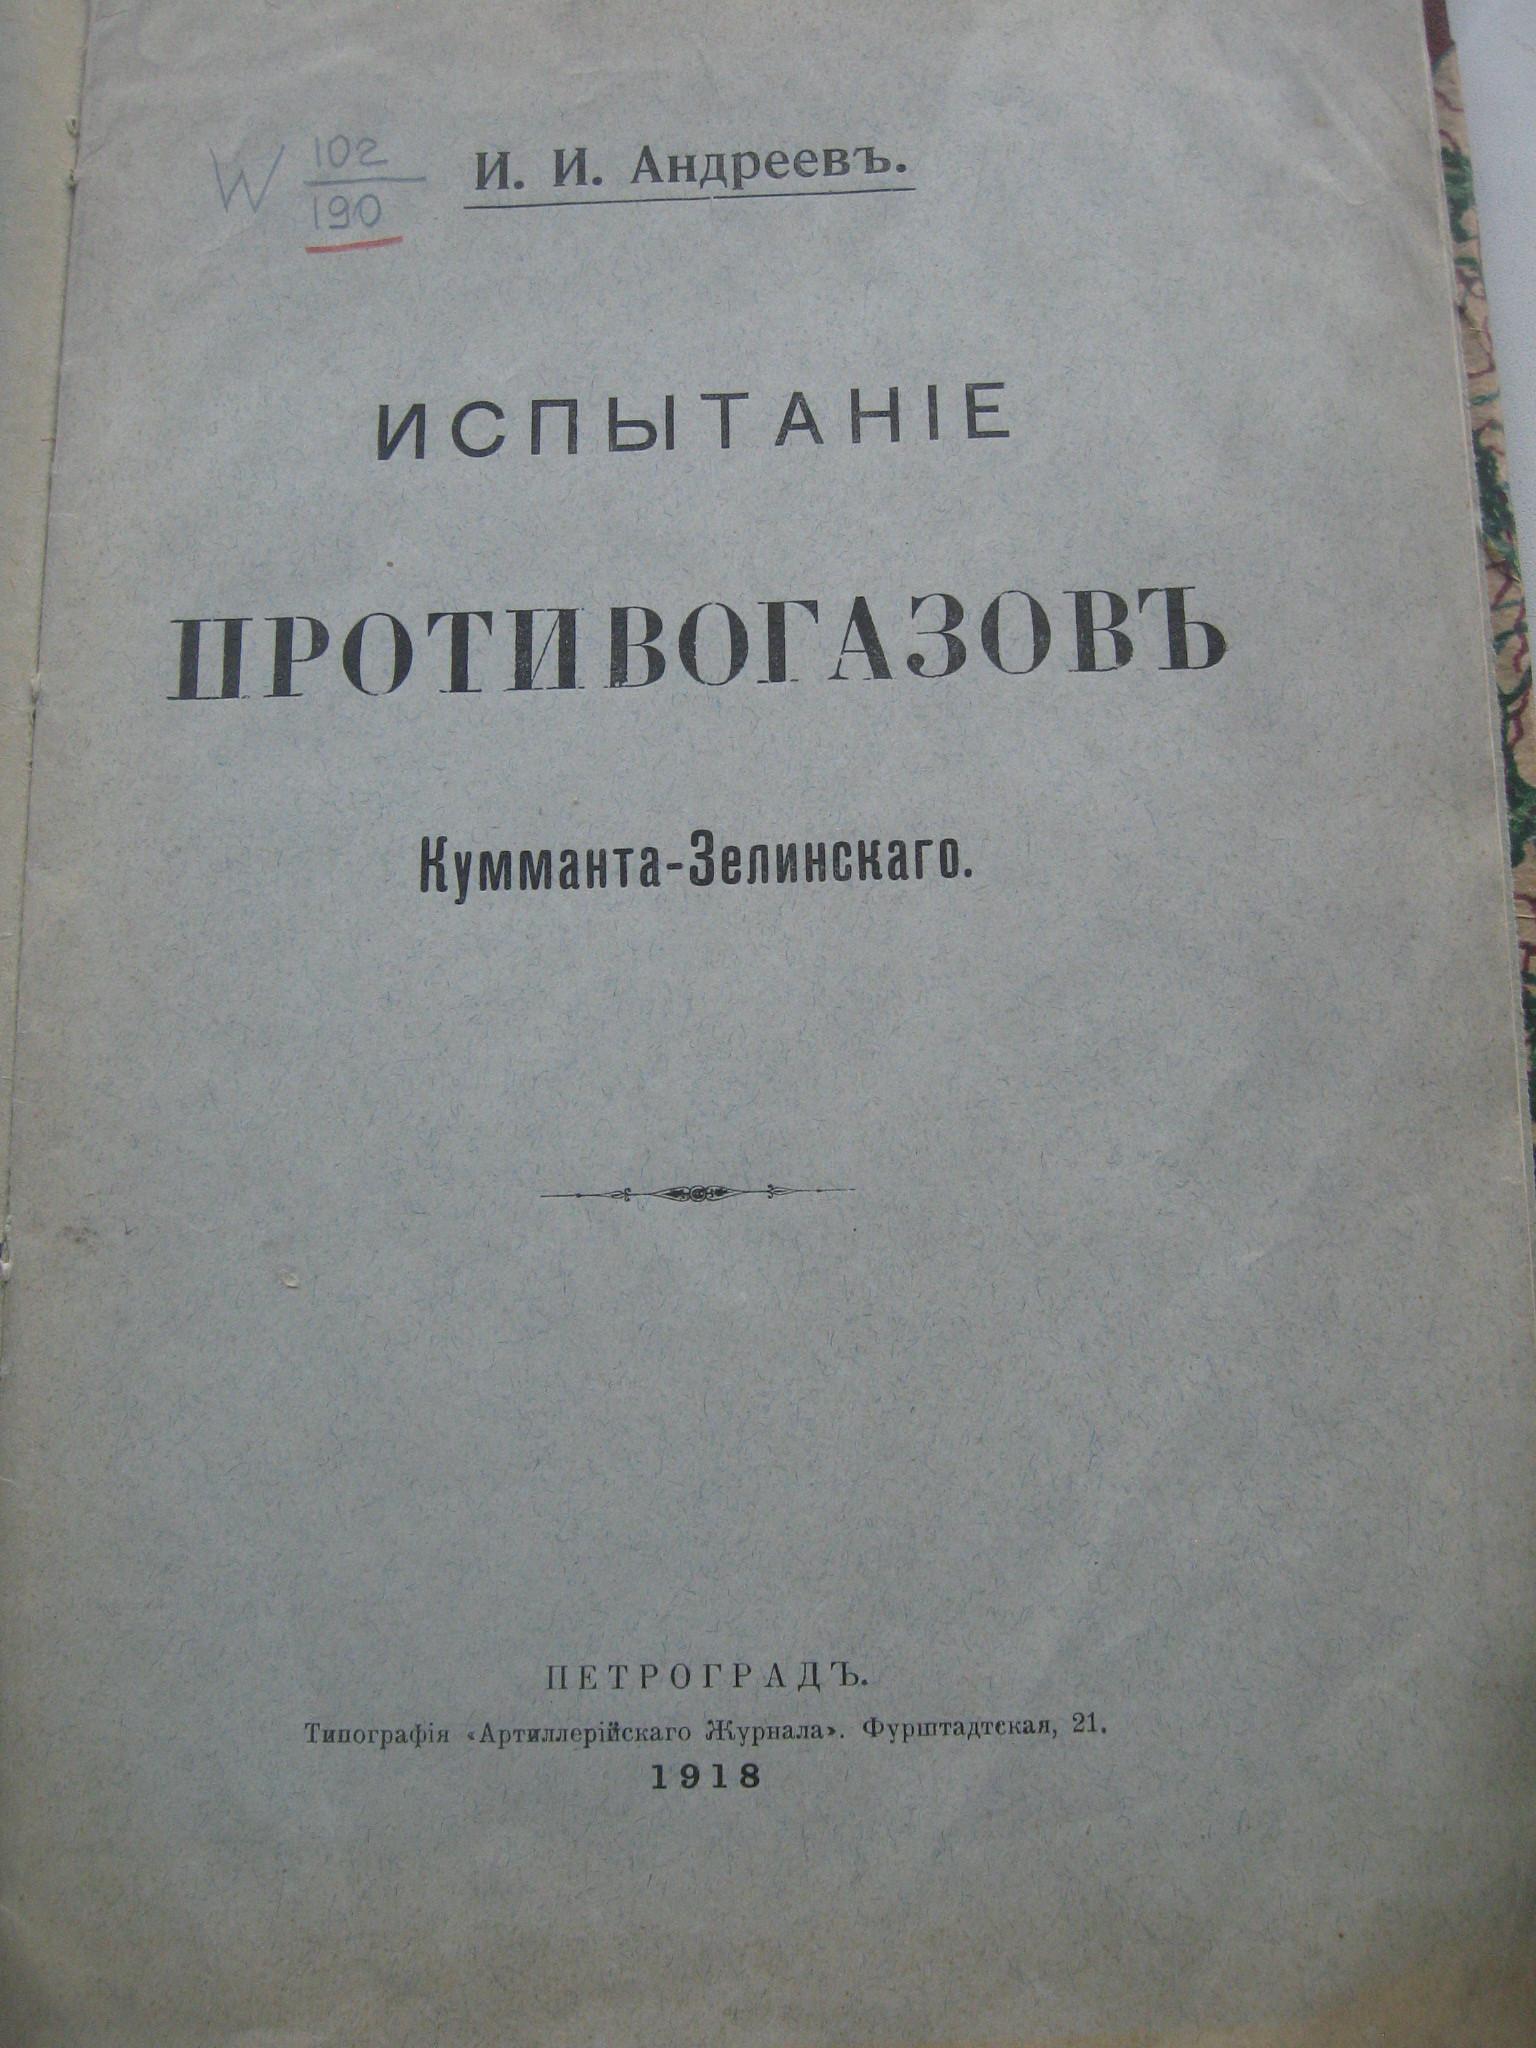 На фото: Испытание противогазов Кумманта-Зелинского. 1918., автор: alexandr.chir